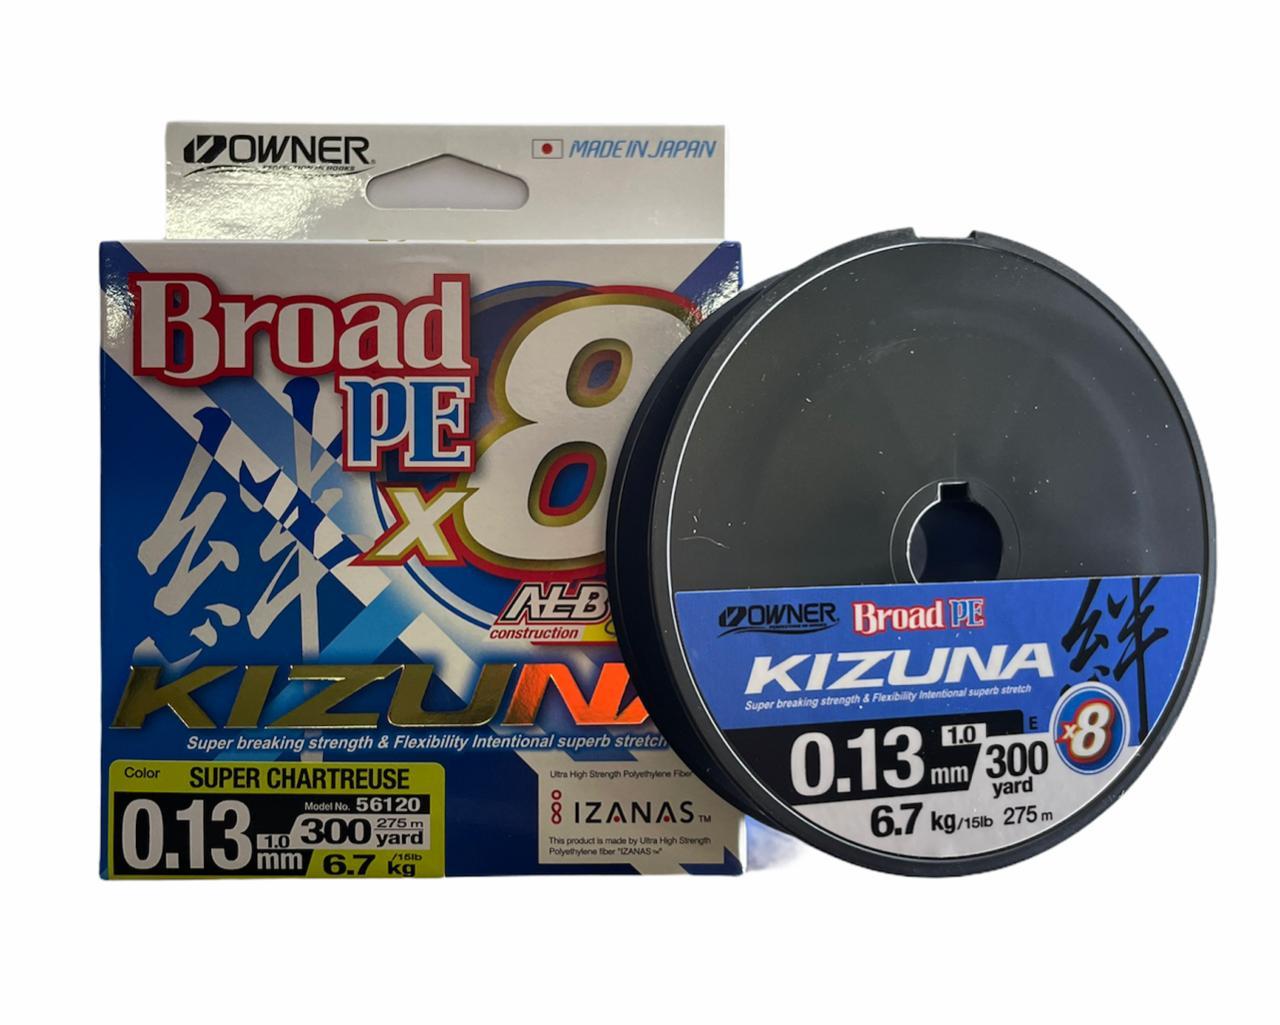 Owner kizuna Broad PE X8 0.13  6.3kg 275m (amarillo)